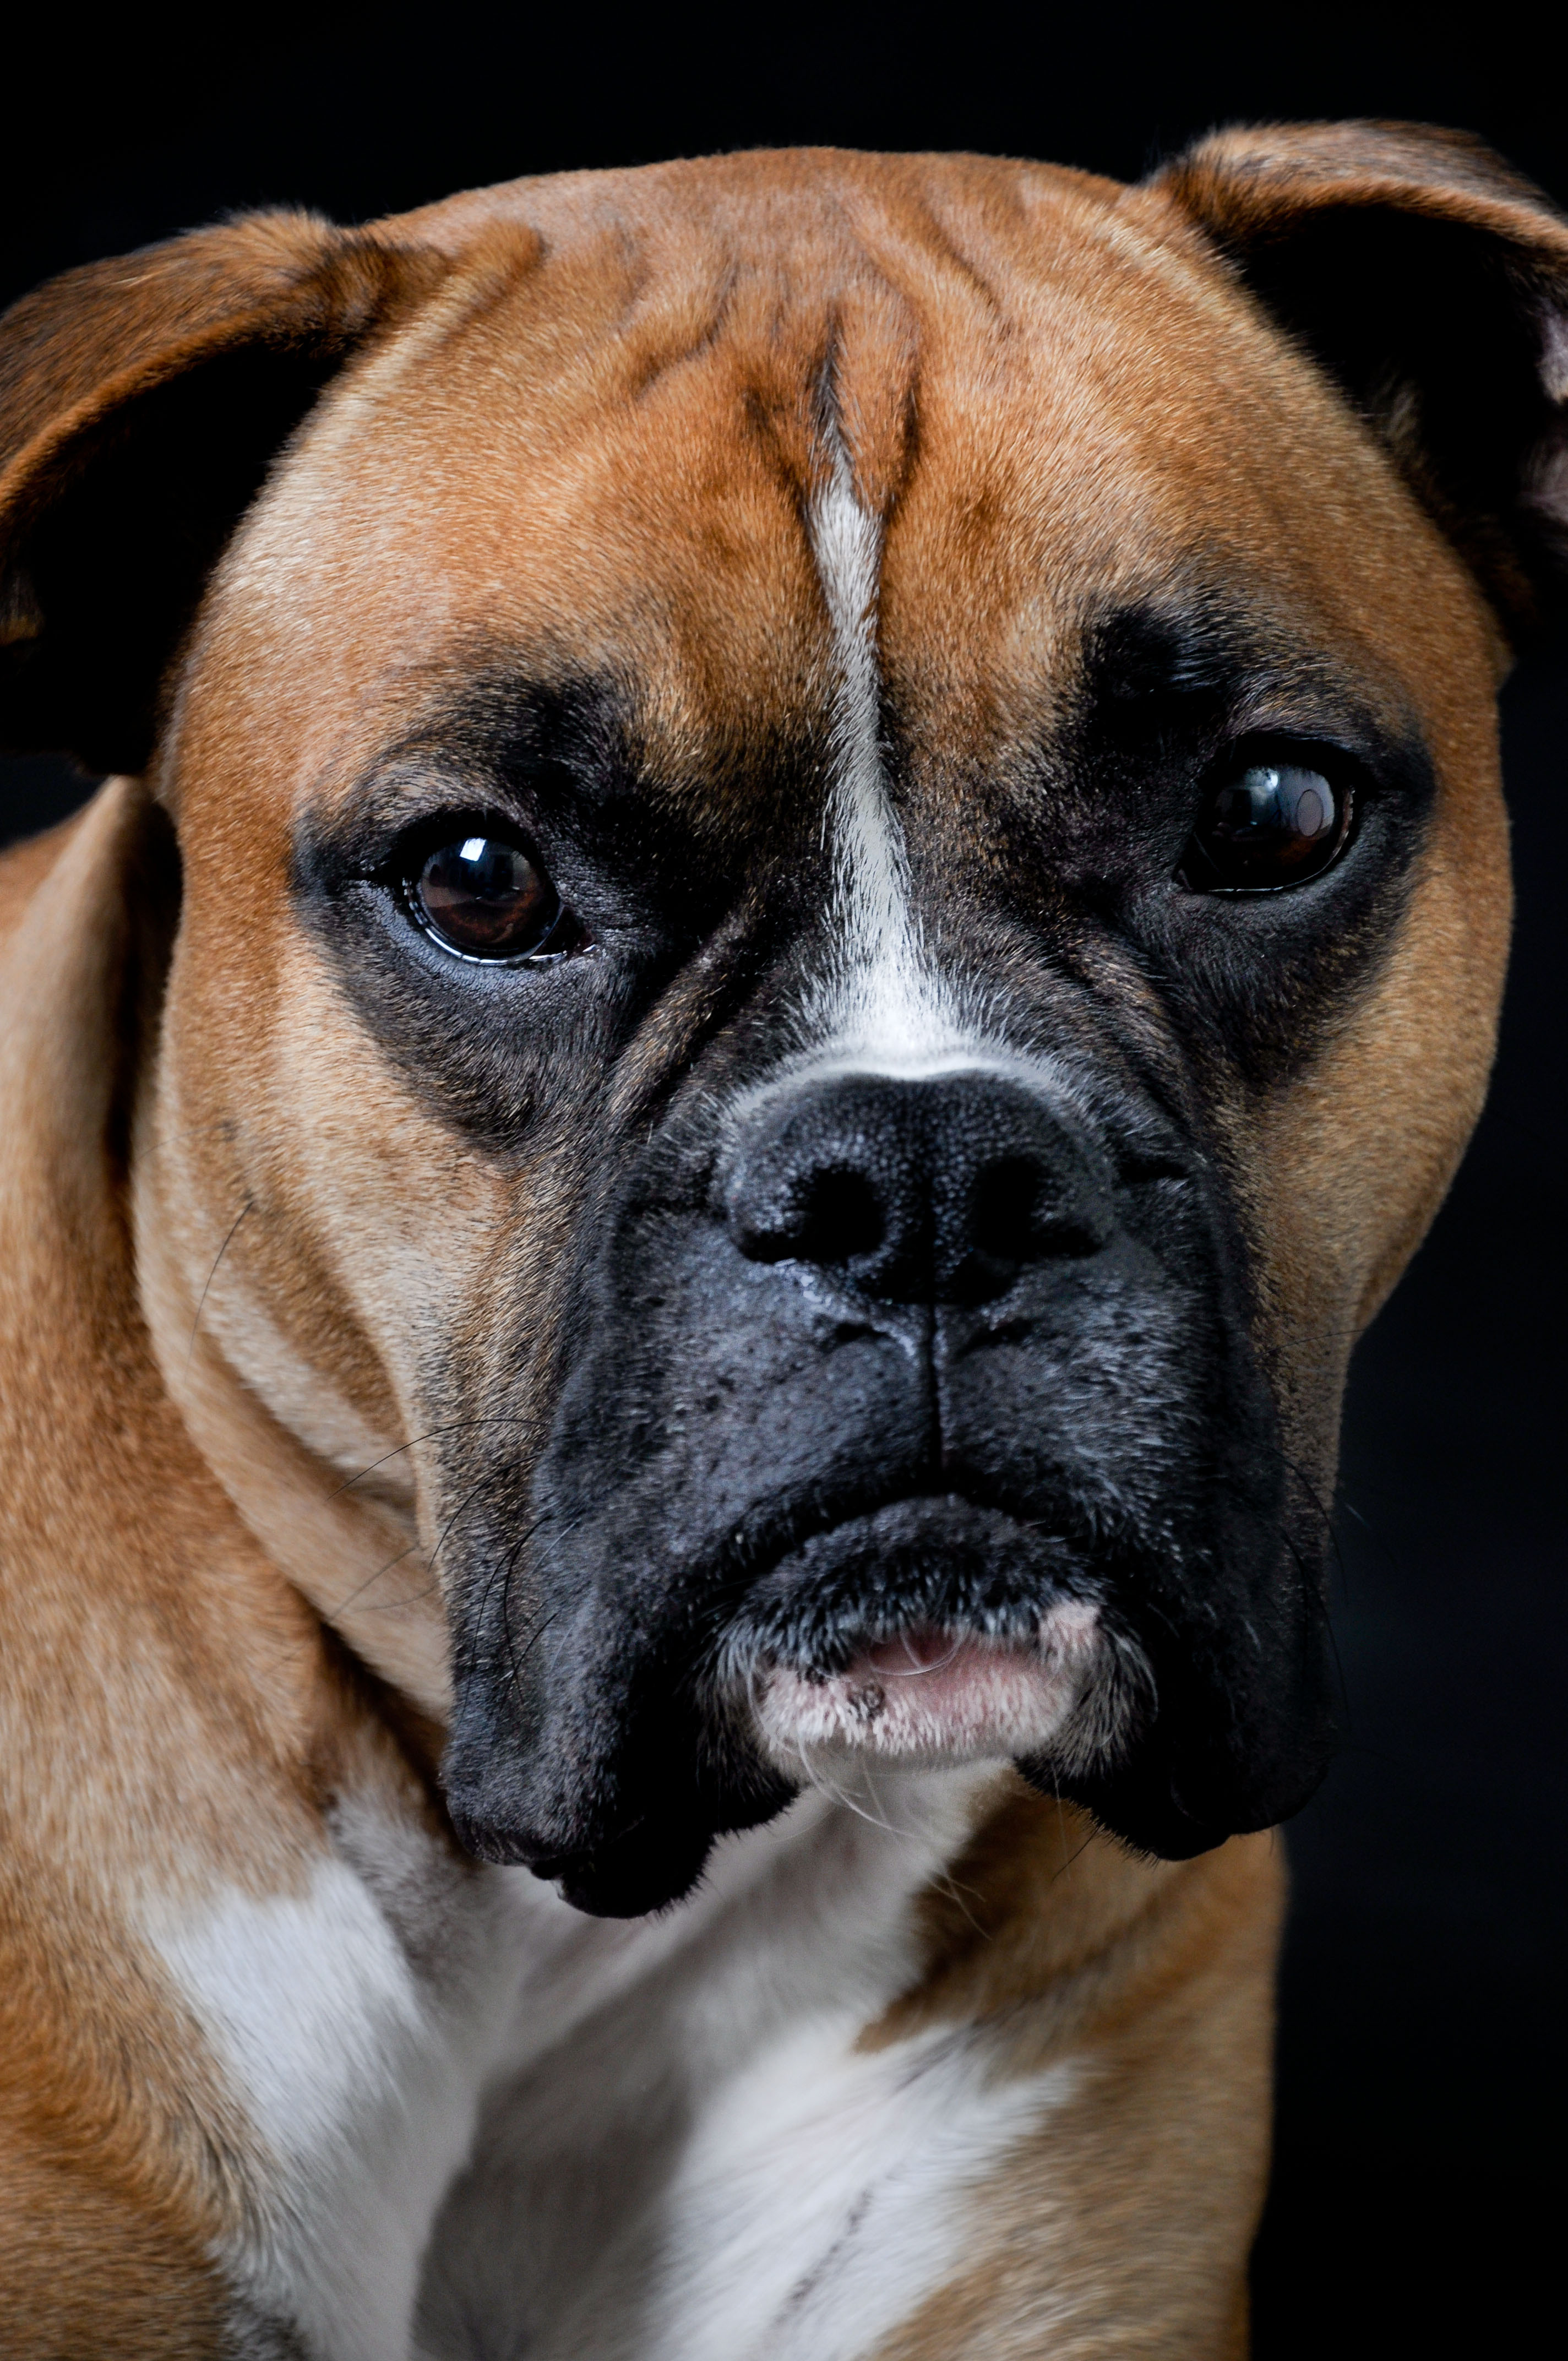 Dog portrait, Angry, Face, Studio, Sad, HQ Photo